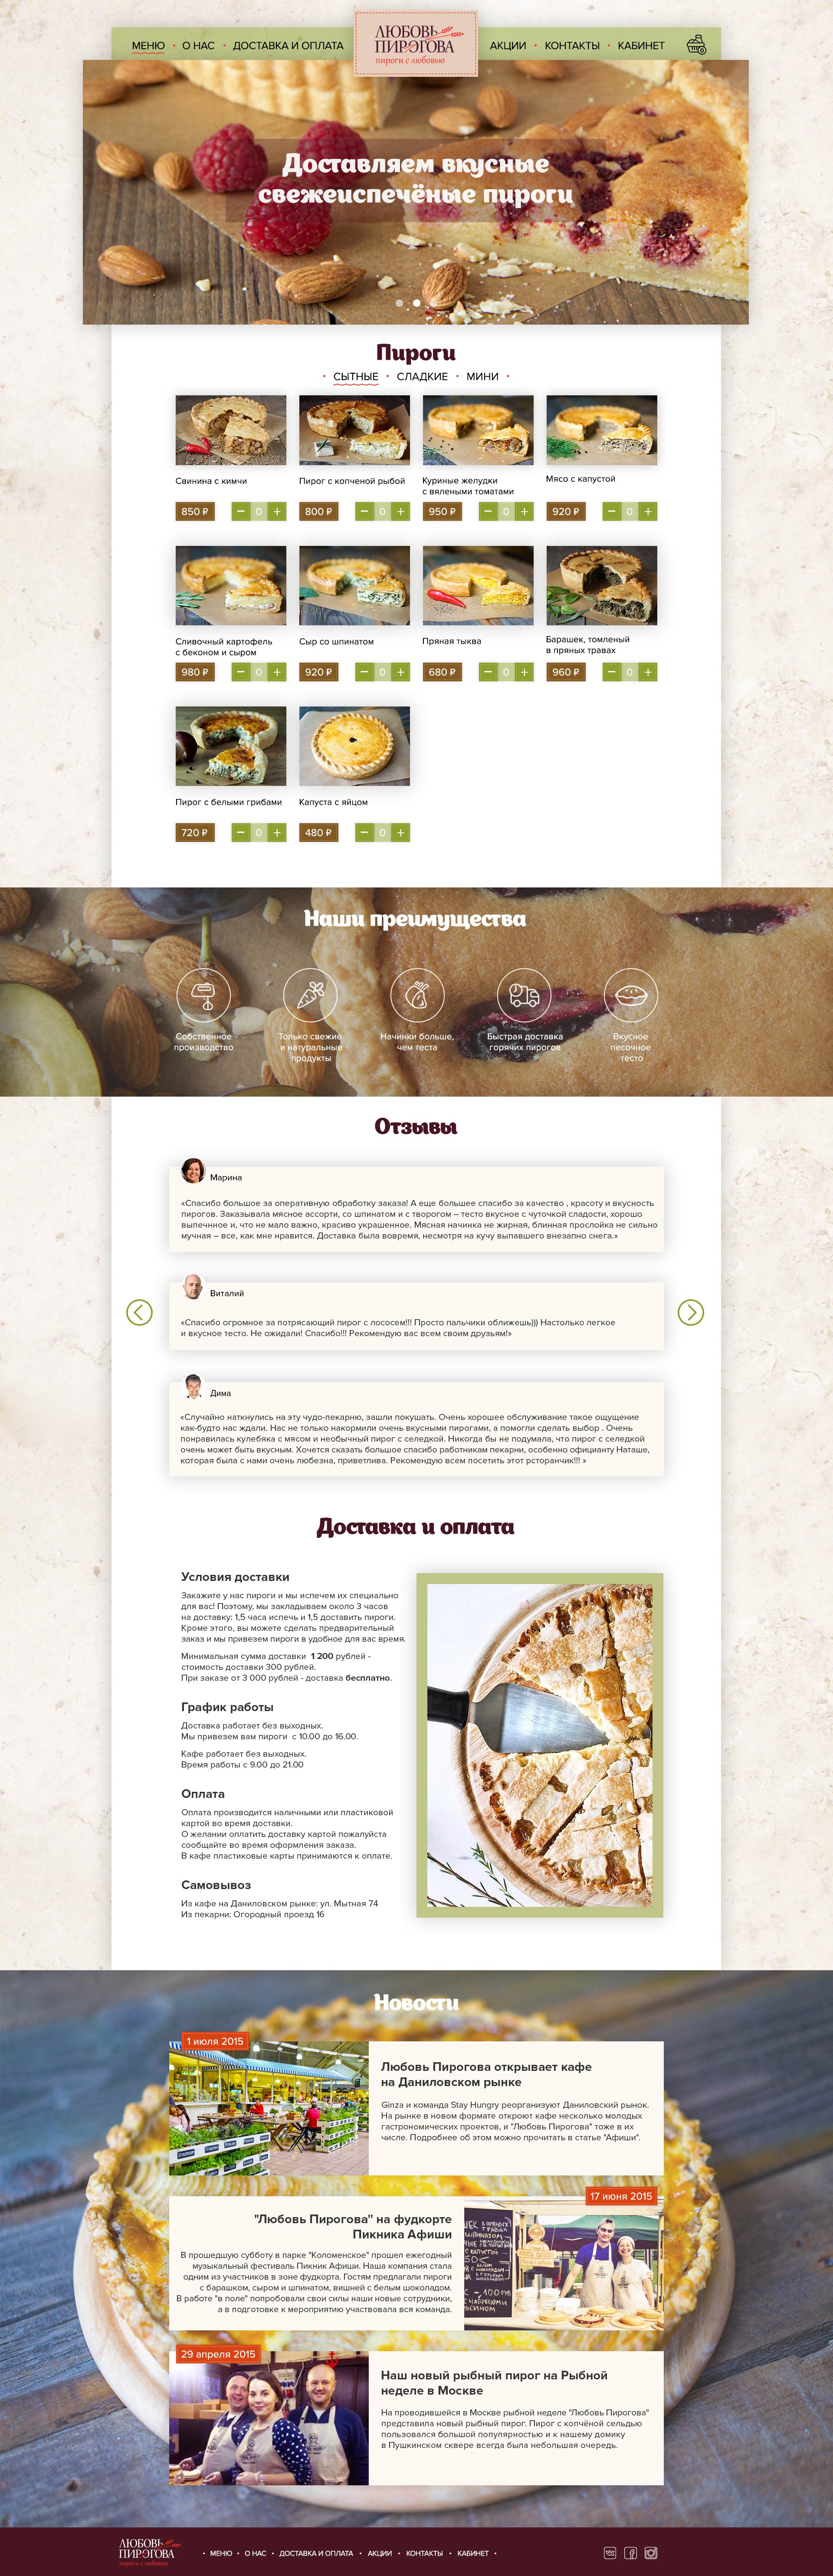 Разработка дизайна сайта lovepirogova.ru фото f_03756b799e3d4960.jpg